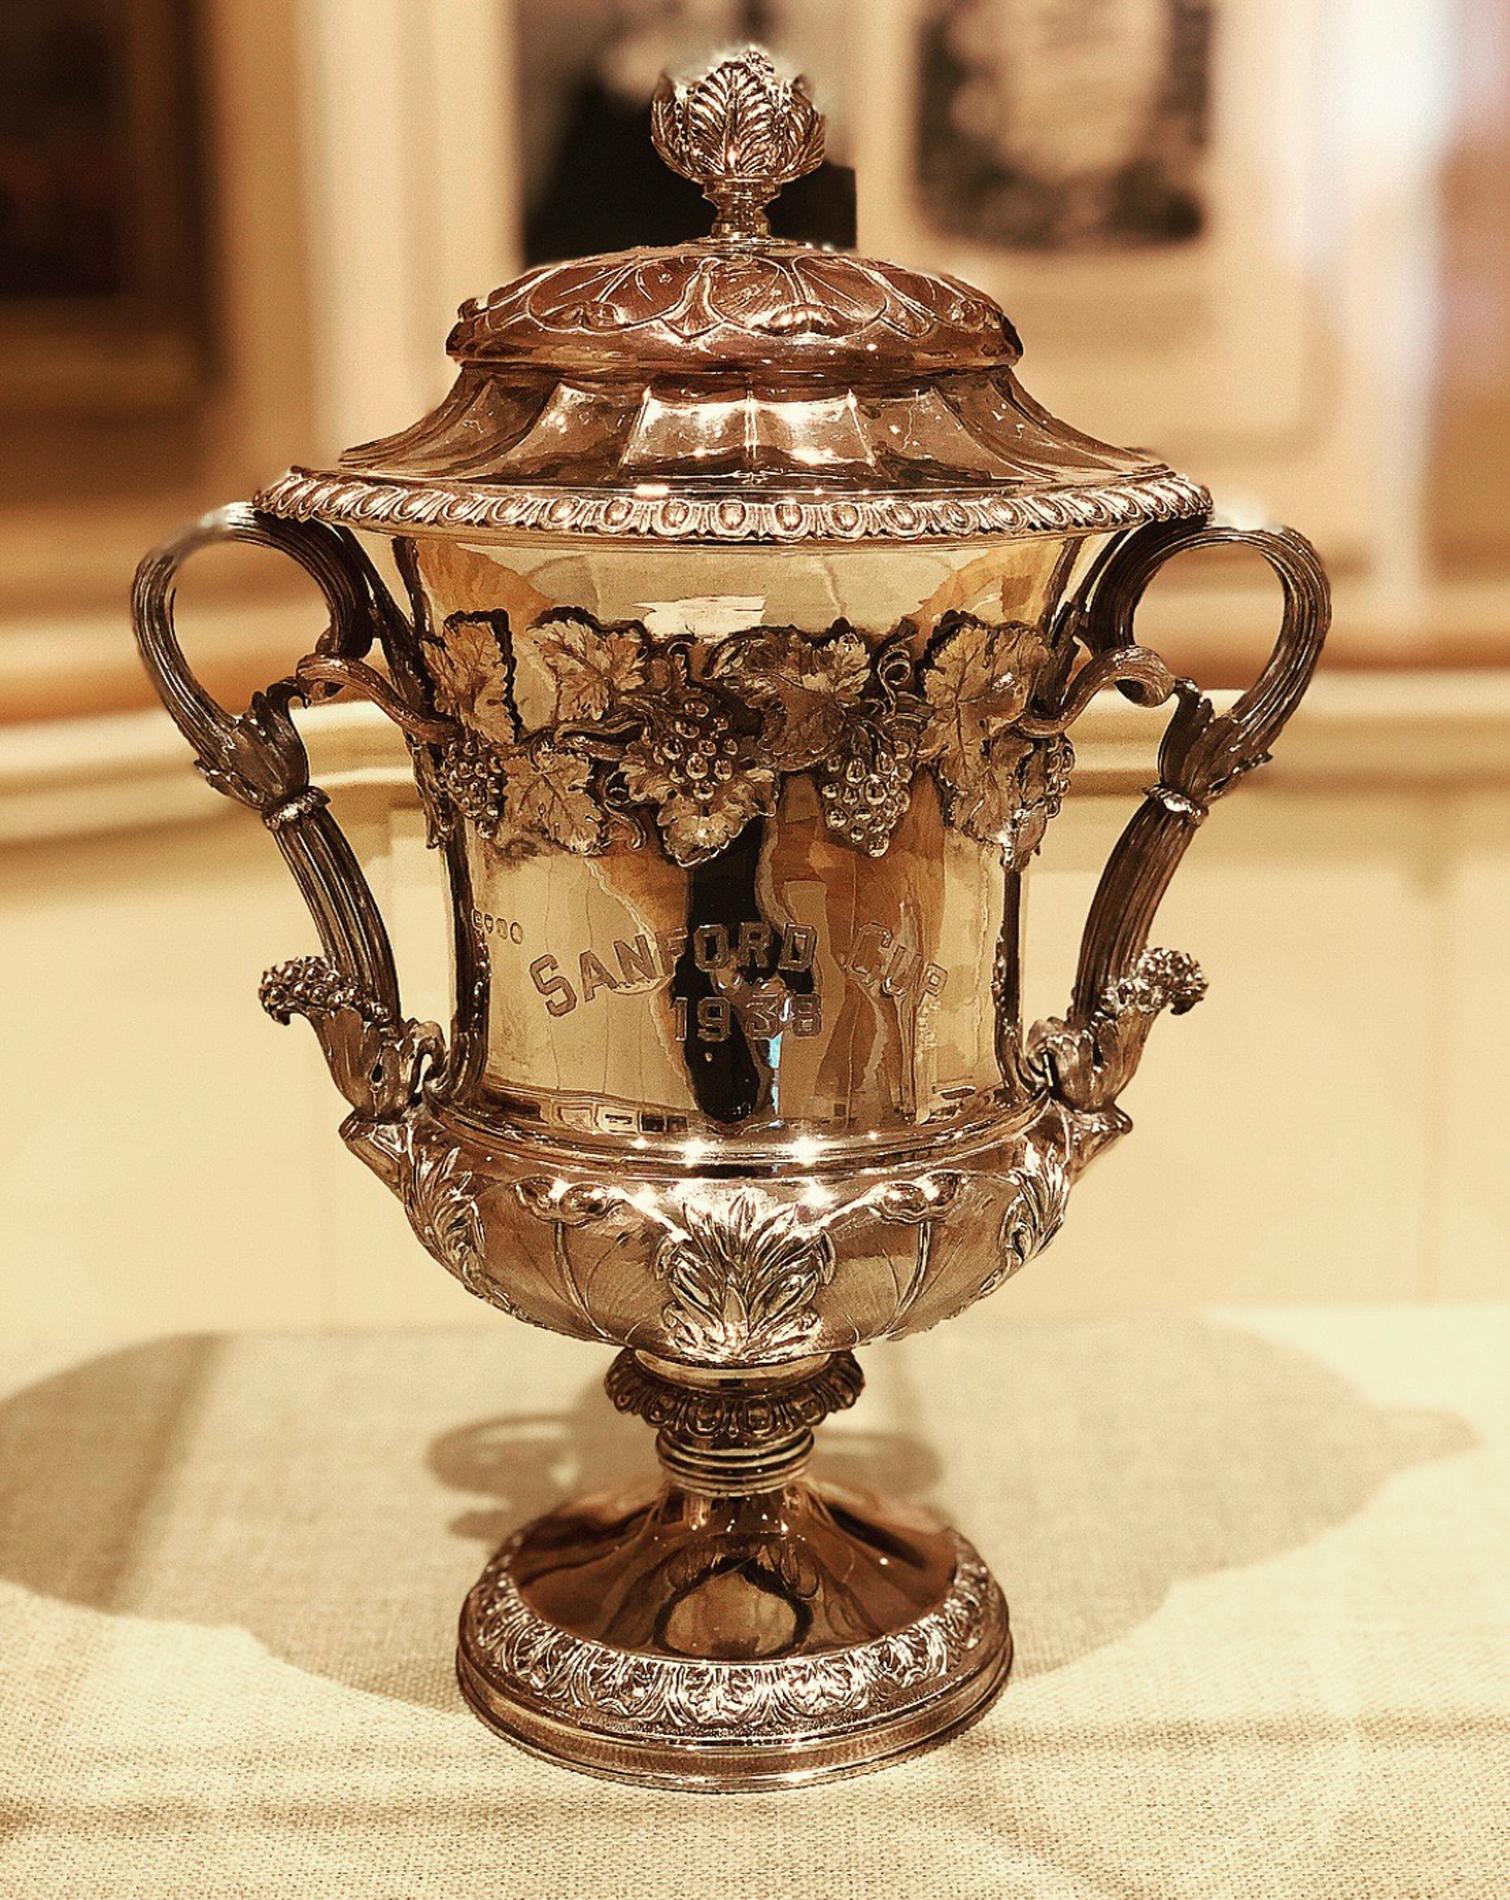 1972.2.11: Sanford Cup, 1938, won by Birch Rod, Gift: F. Eugene Dixon, Jr., Mrs. Paul Carpenter Dewey, Mrs. W. Dyer Jones, Mrs. Messmore Kendall, Mrs. Warwick Fay Neville